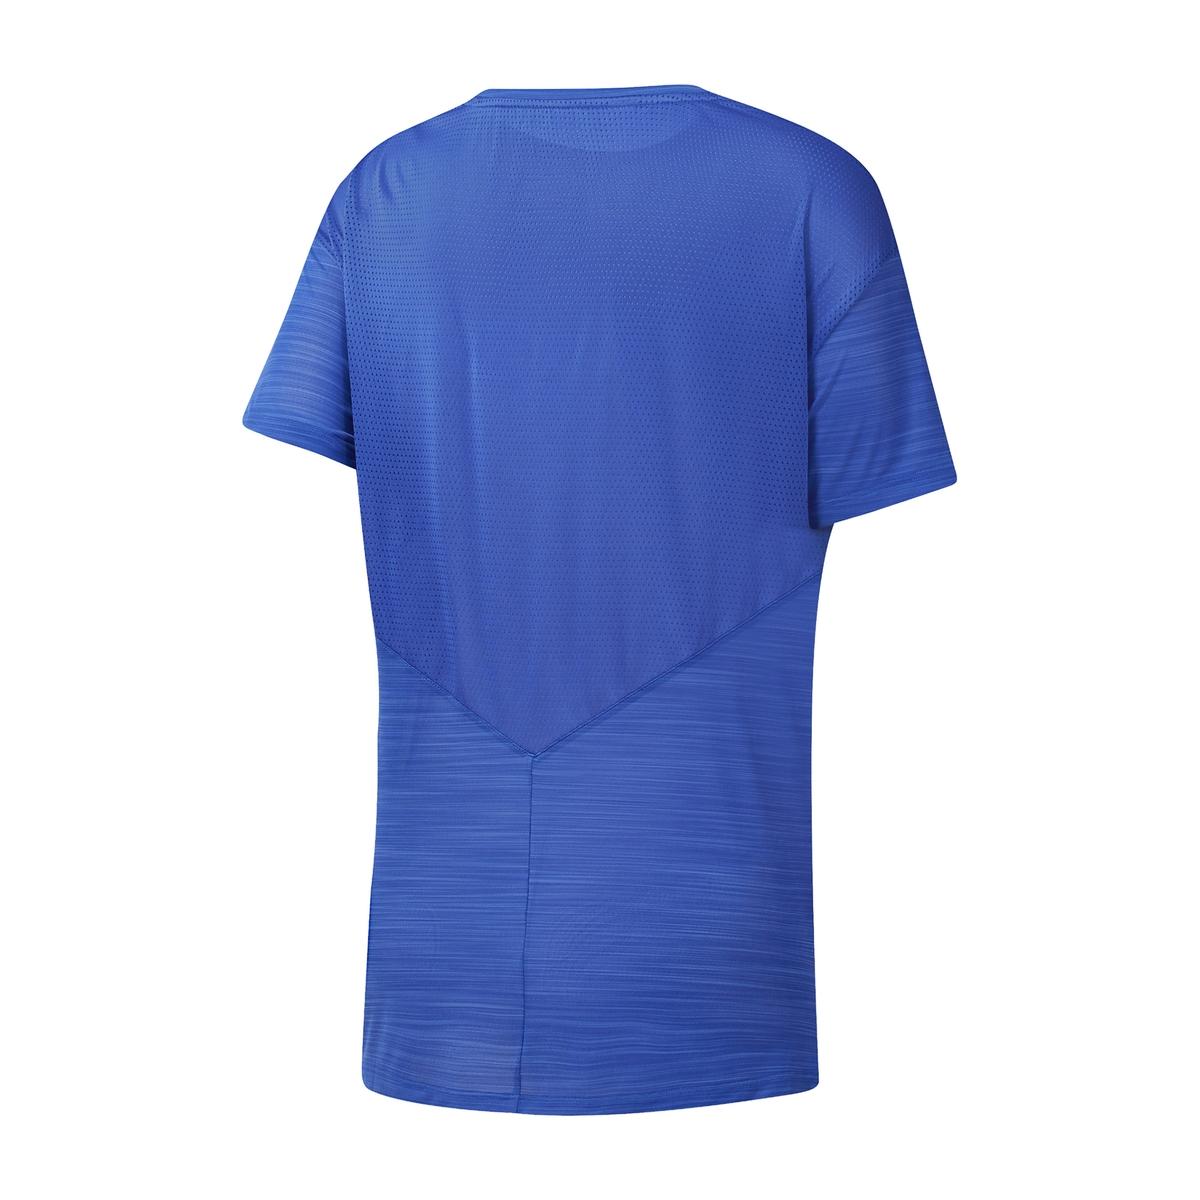 Imagen secundaria de producto de Camiseta de deporte Wor AC - Reebok